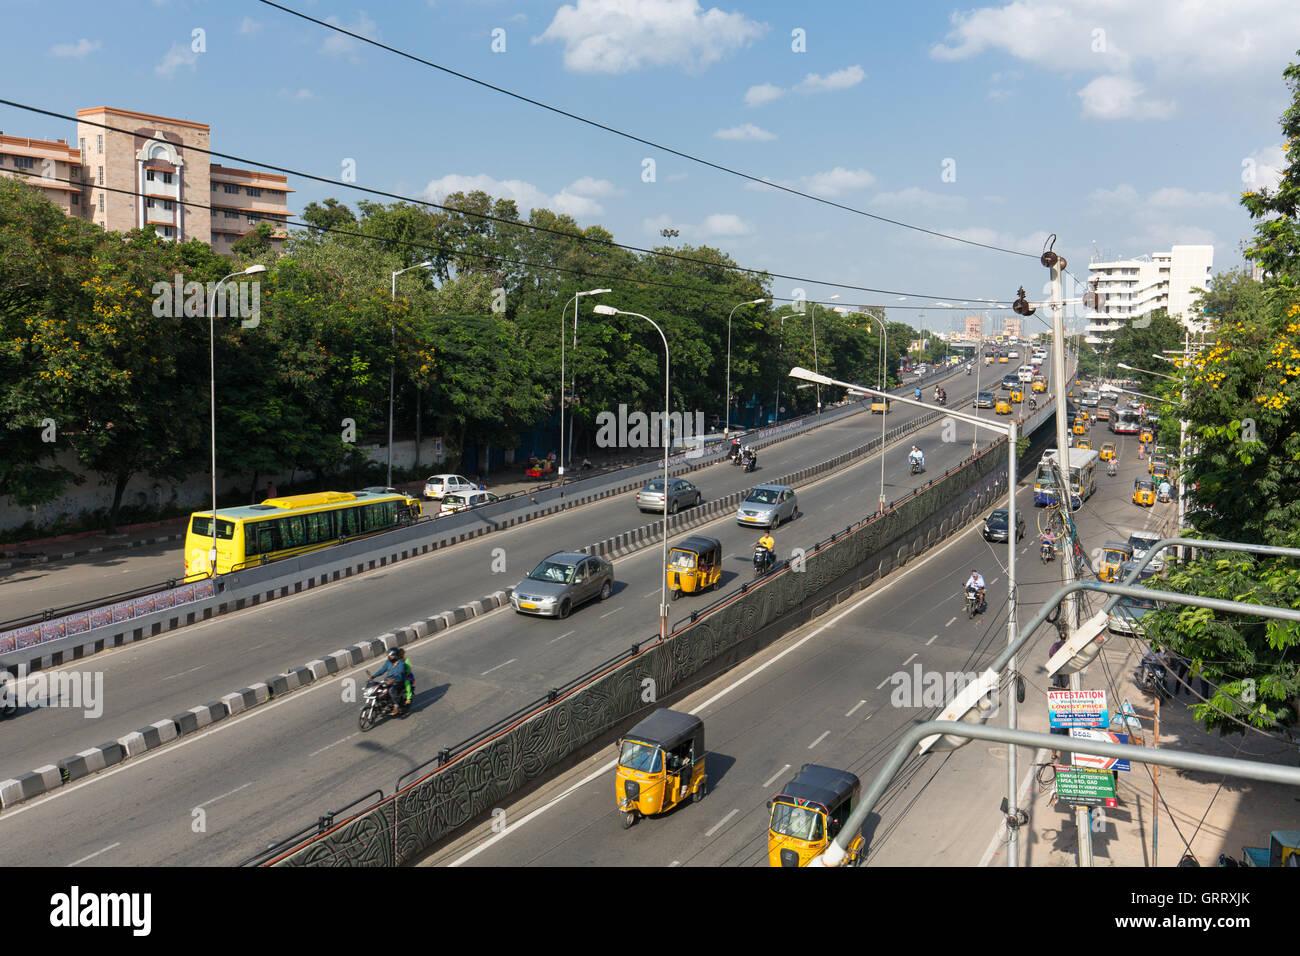 Telangana Secretariat at Telugu Talli Flyover - Stock Image